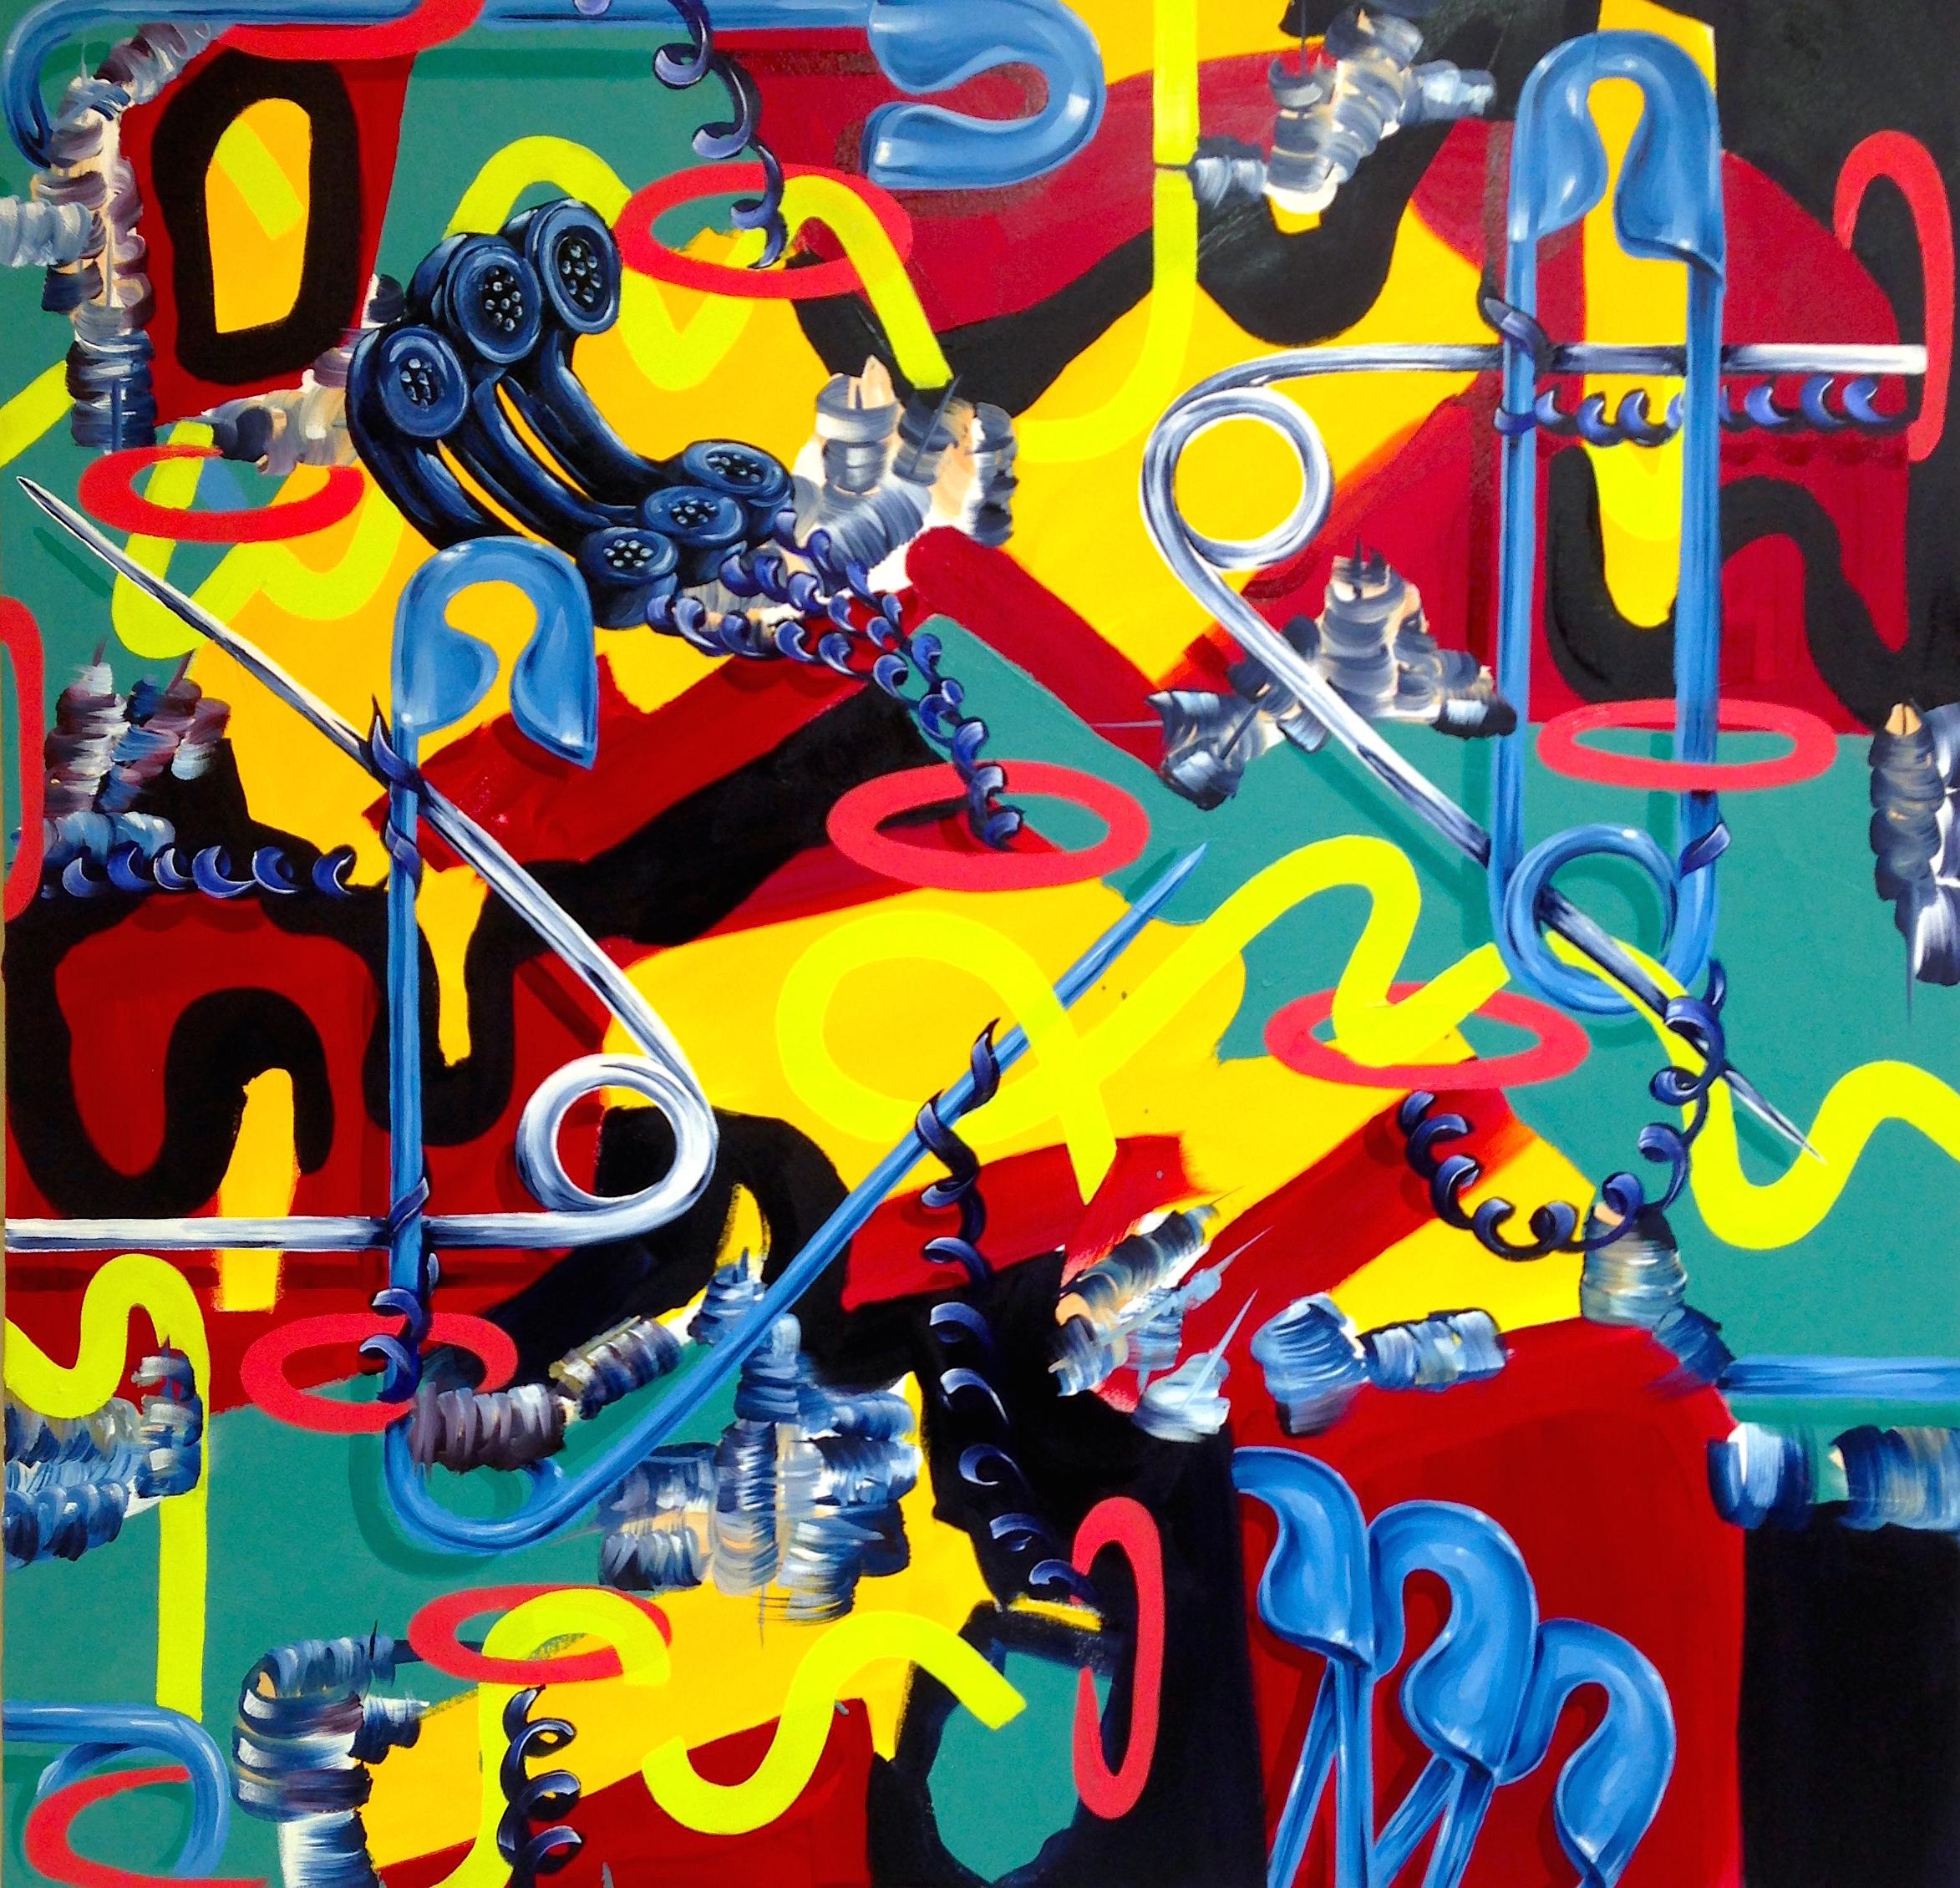 """1980"" 48""x 48"" Oil on Canvas 2015"